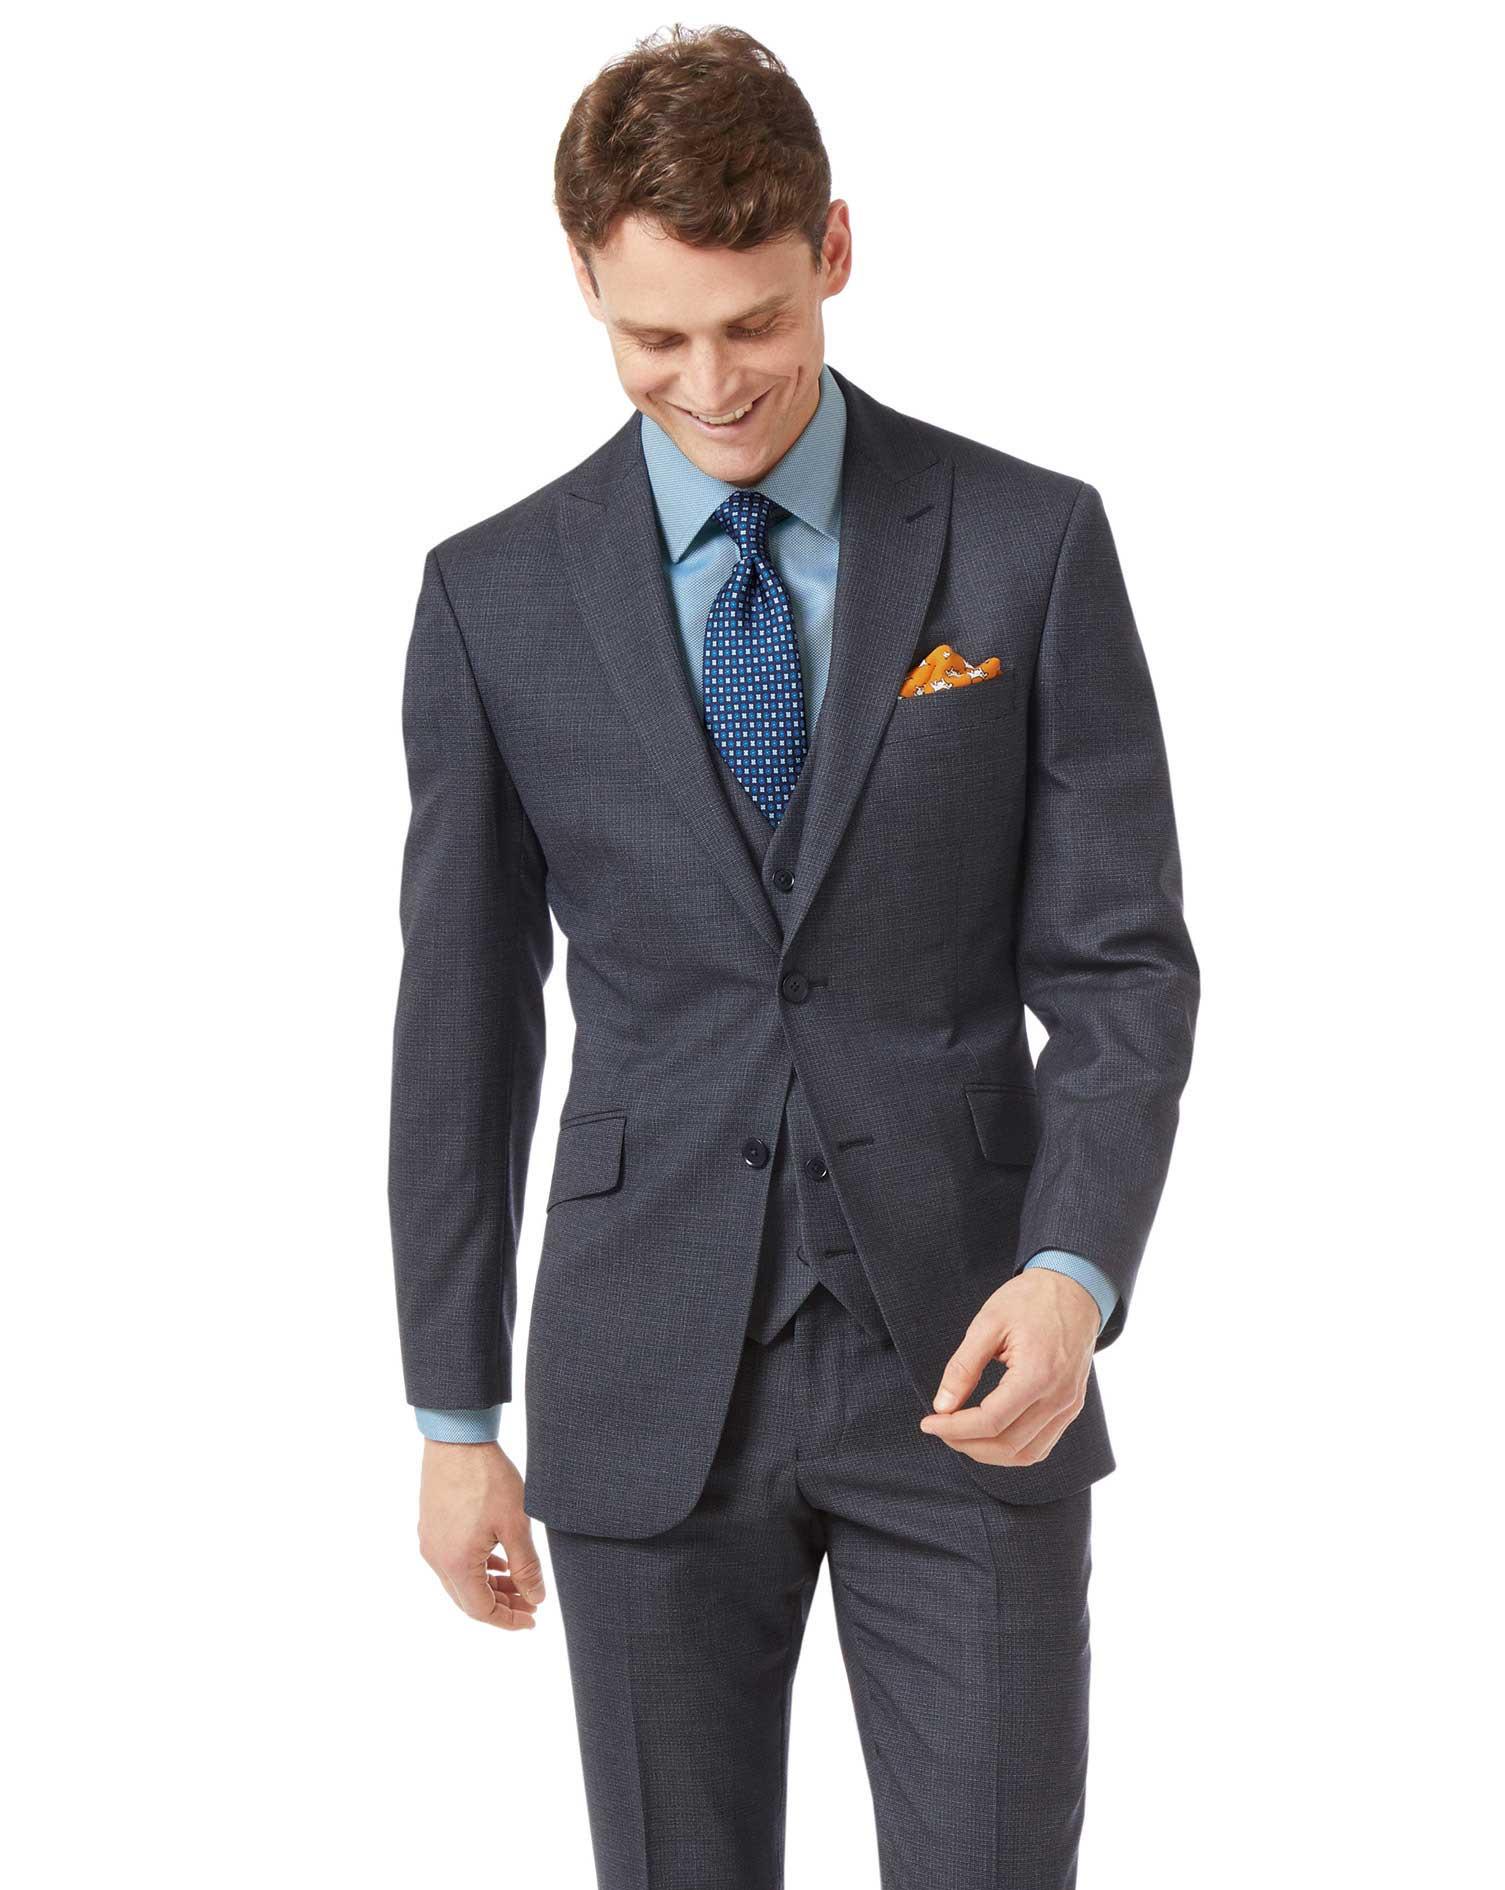 Airforce Blue Slim Jaspe Business Suit Wool Jacket Size 38 Short by Charles Tyrwhitt